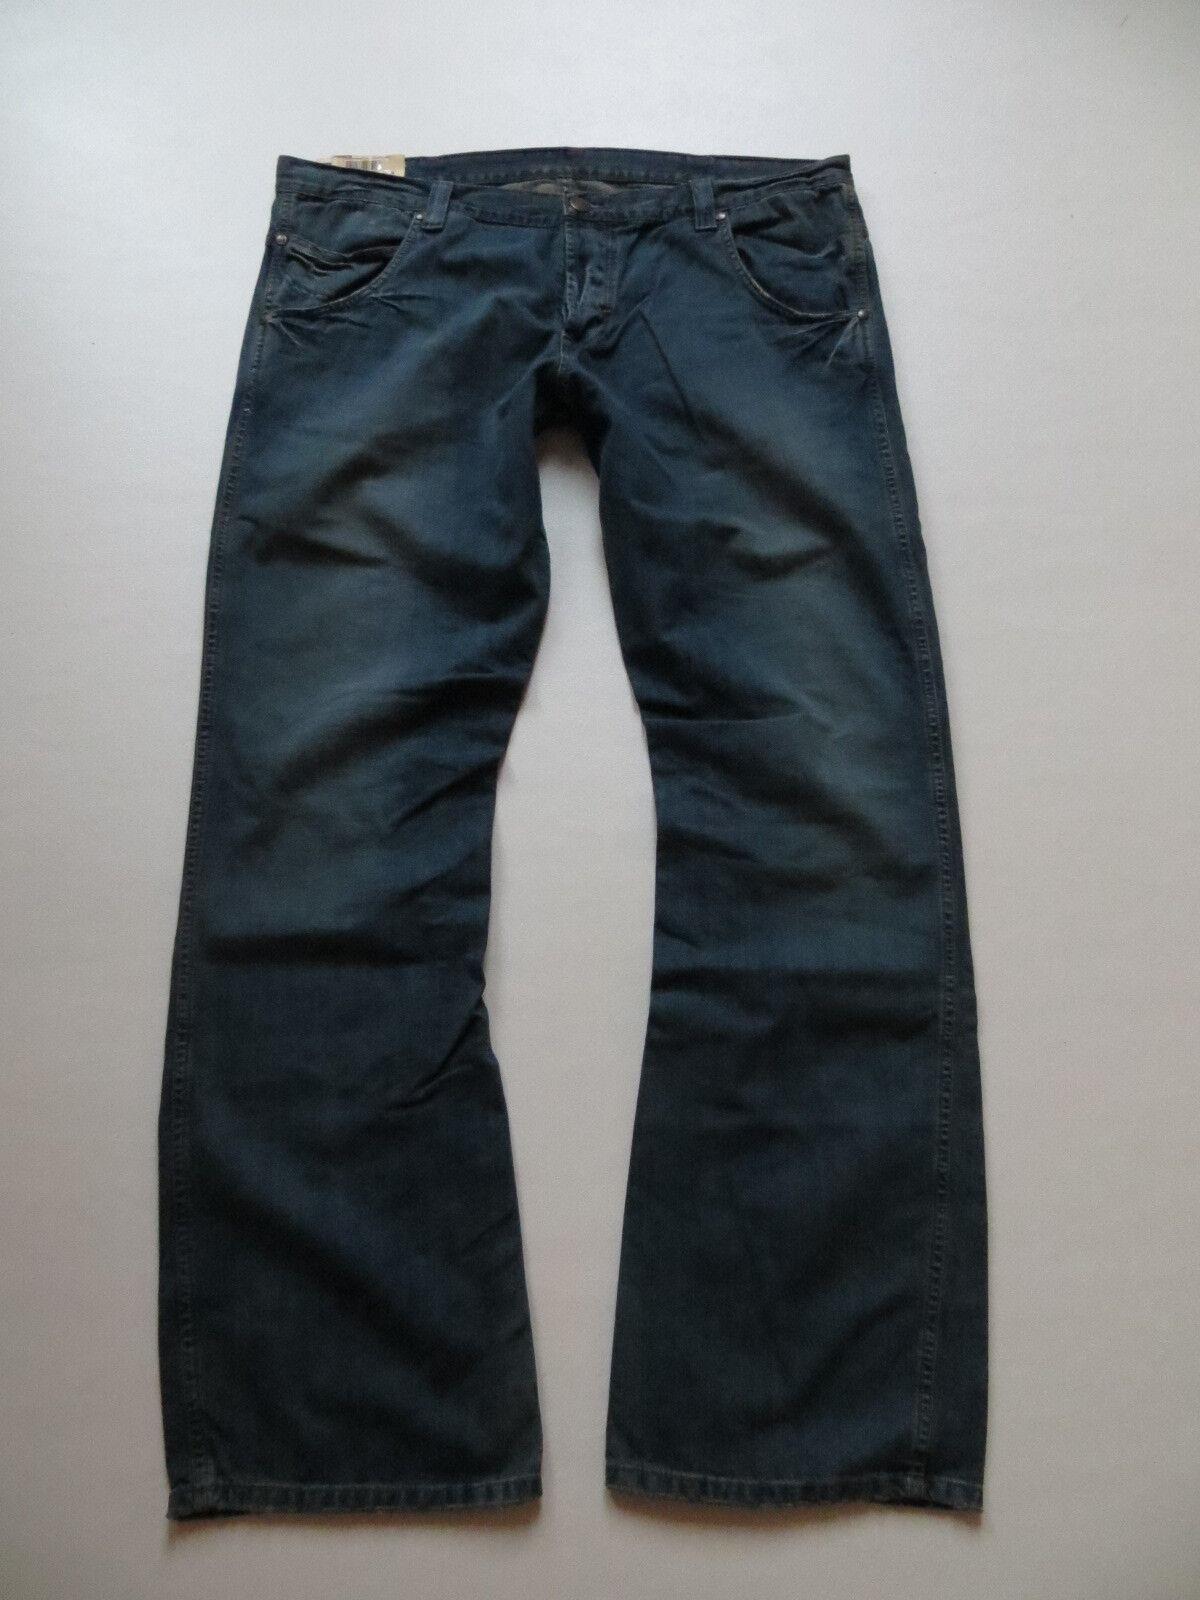 Wrangler SHARKEY Stiefelcut Jeans Hose W 38  L 34 NEU   INCA ASHES X-Low Denim